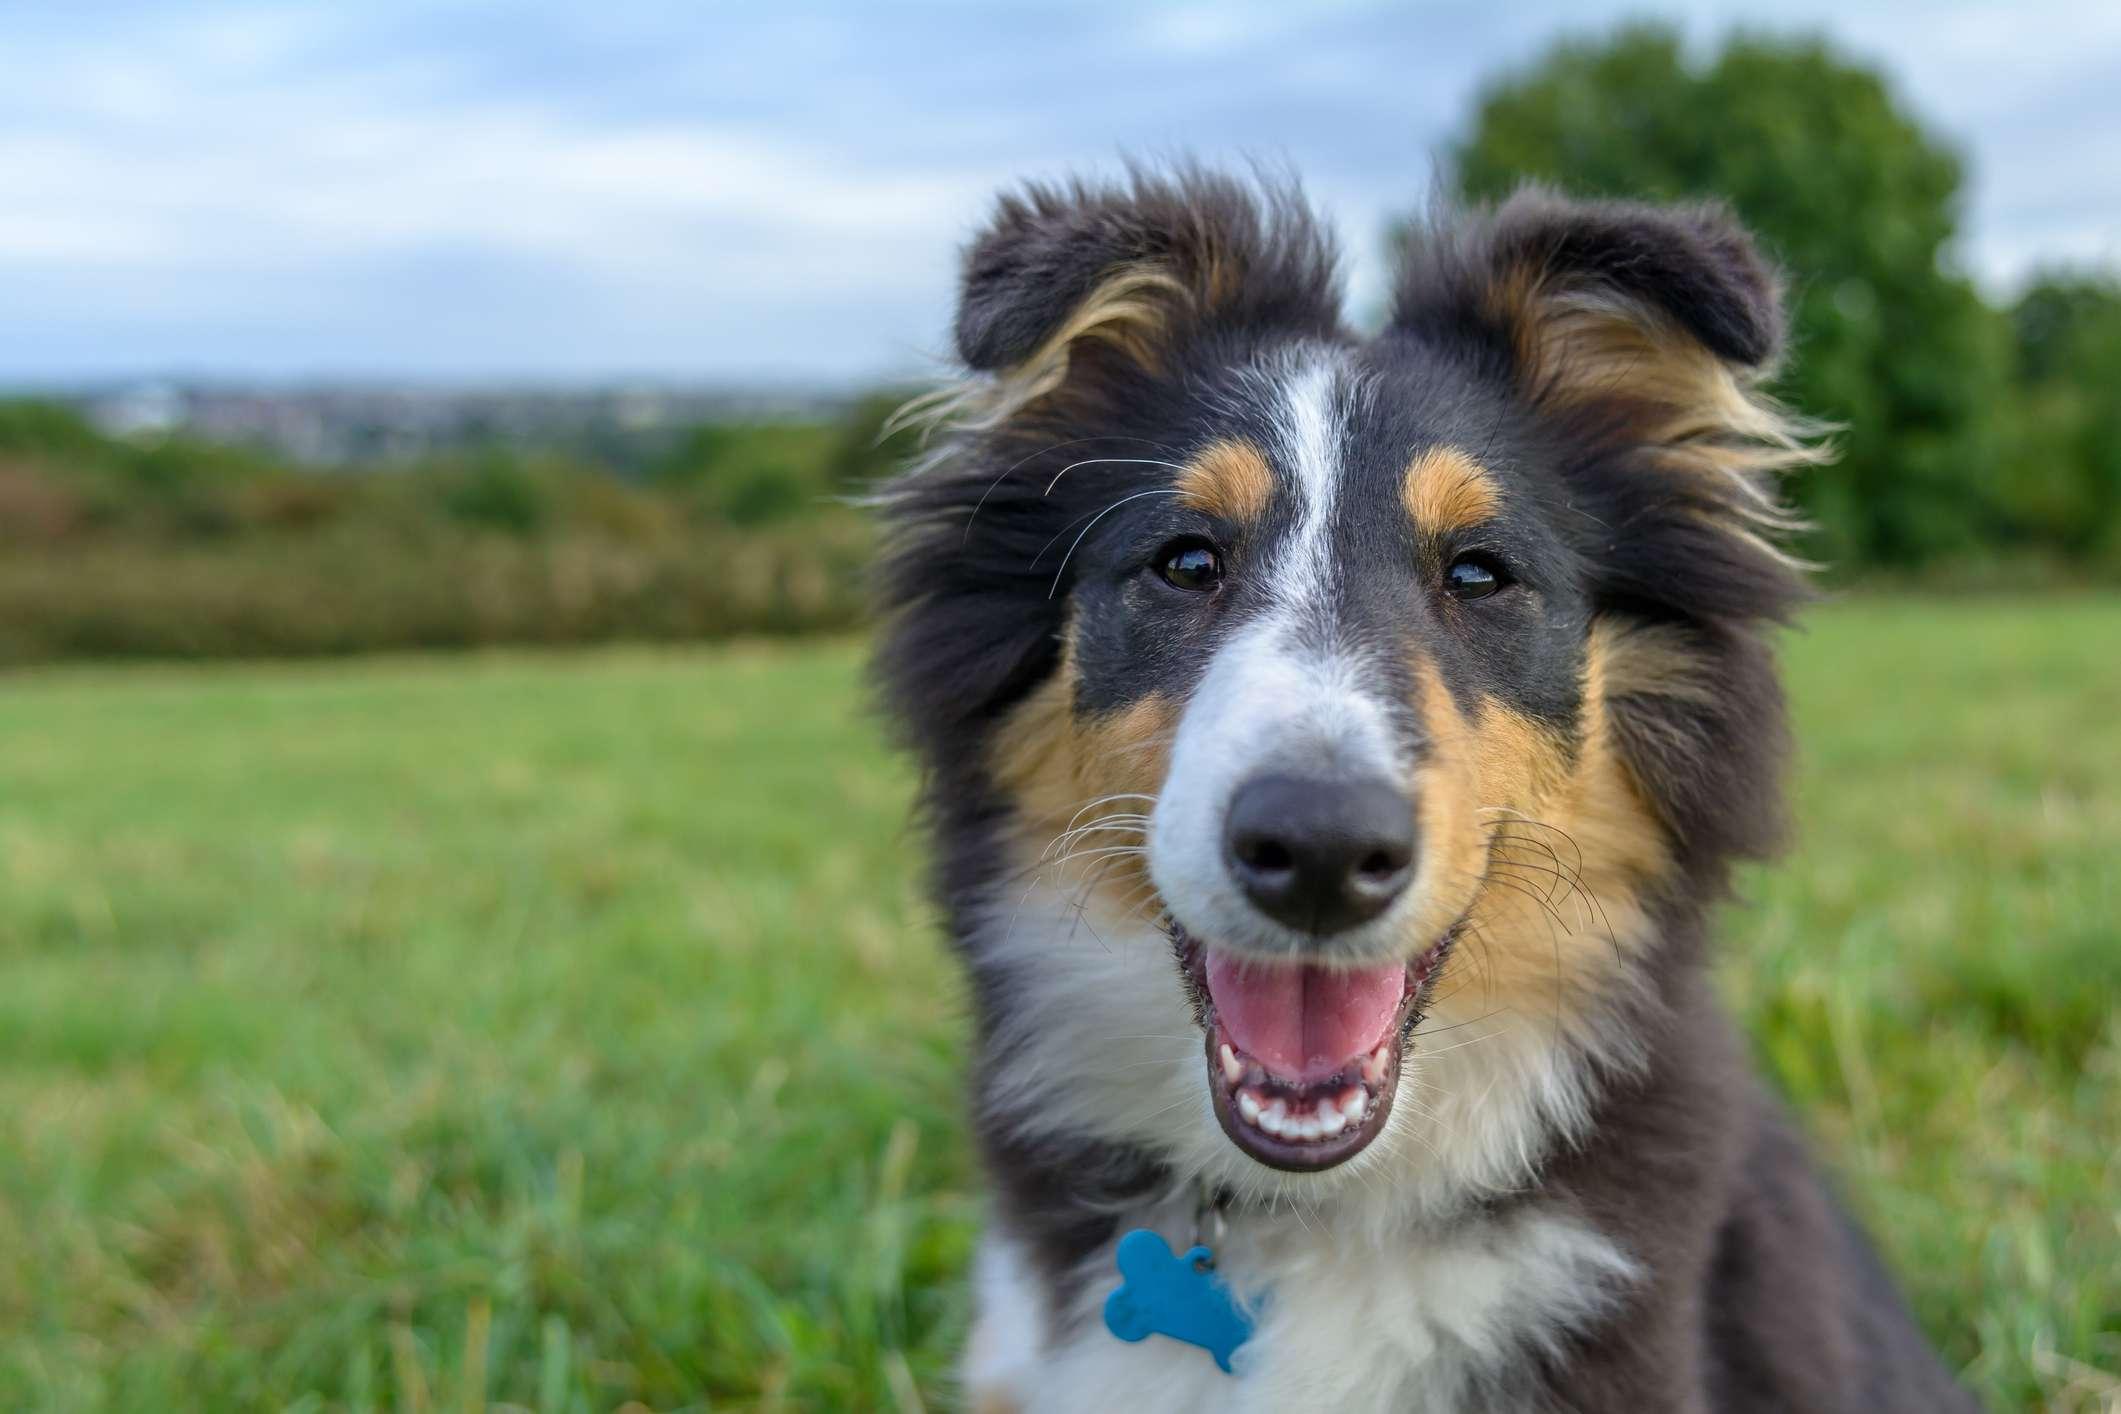 Neck-up shot of Shetland sheepdog